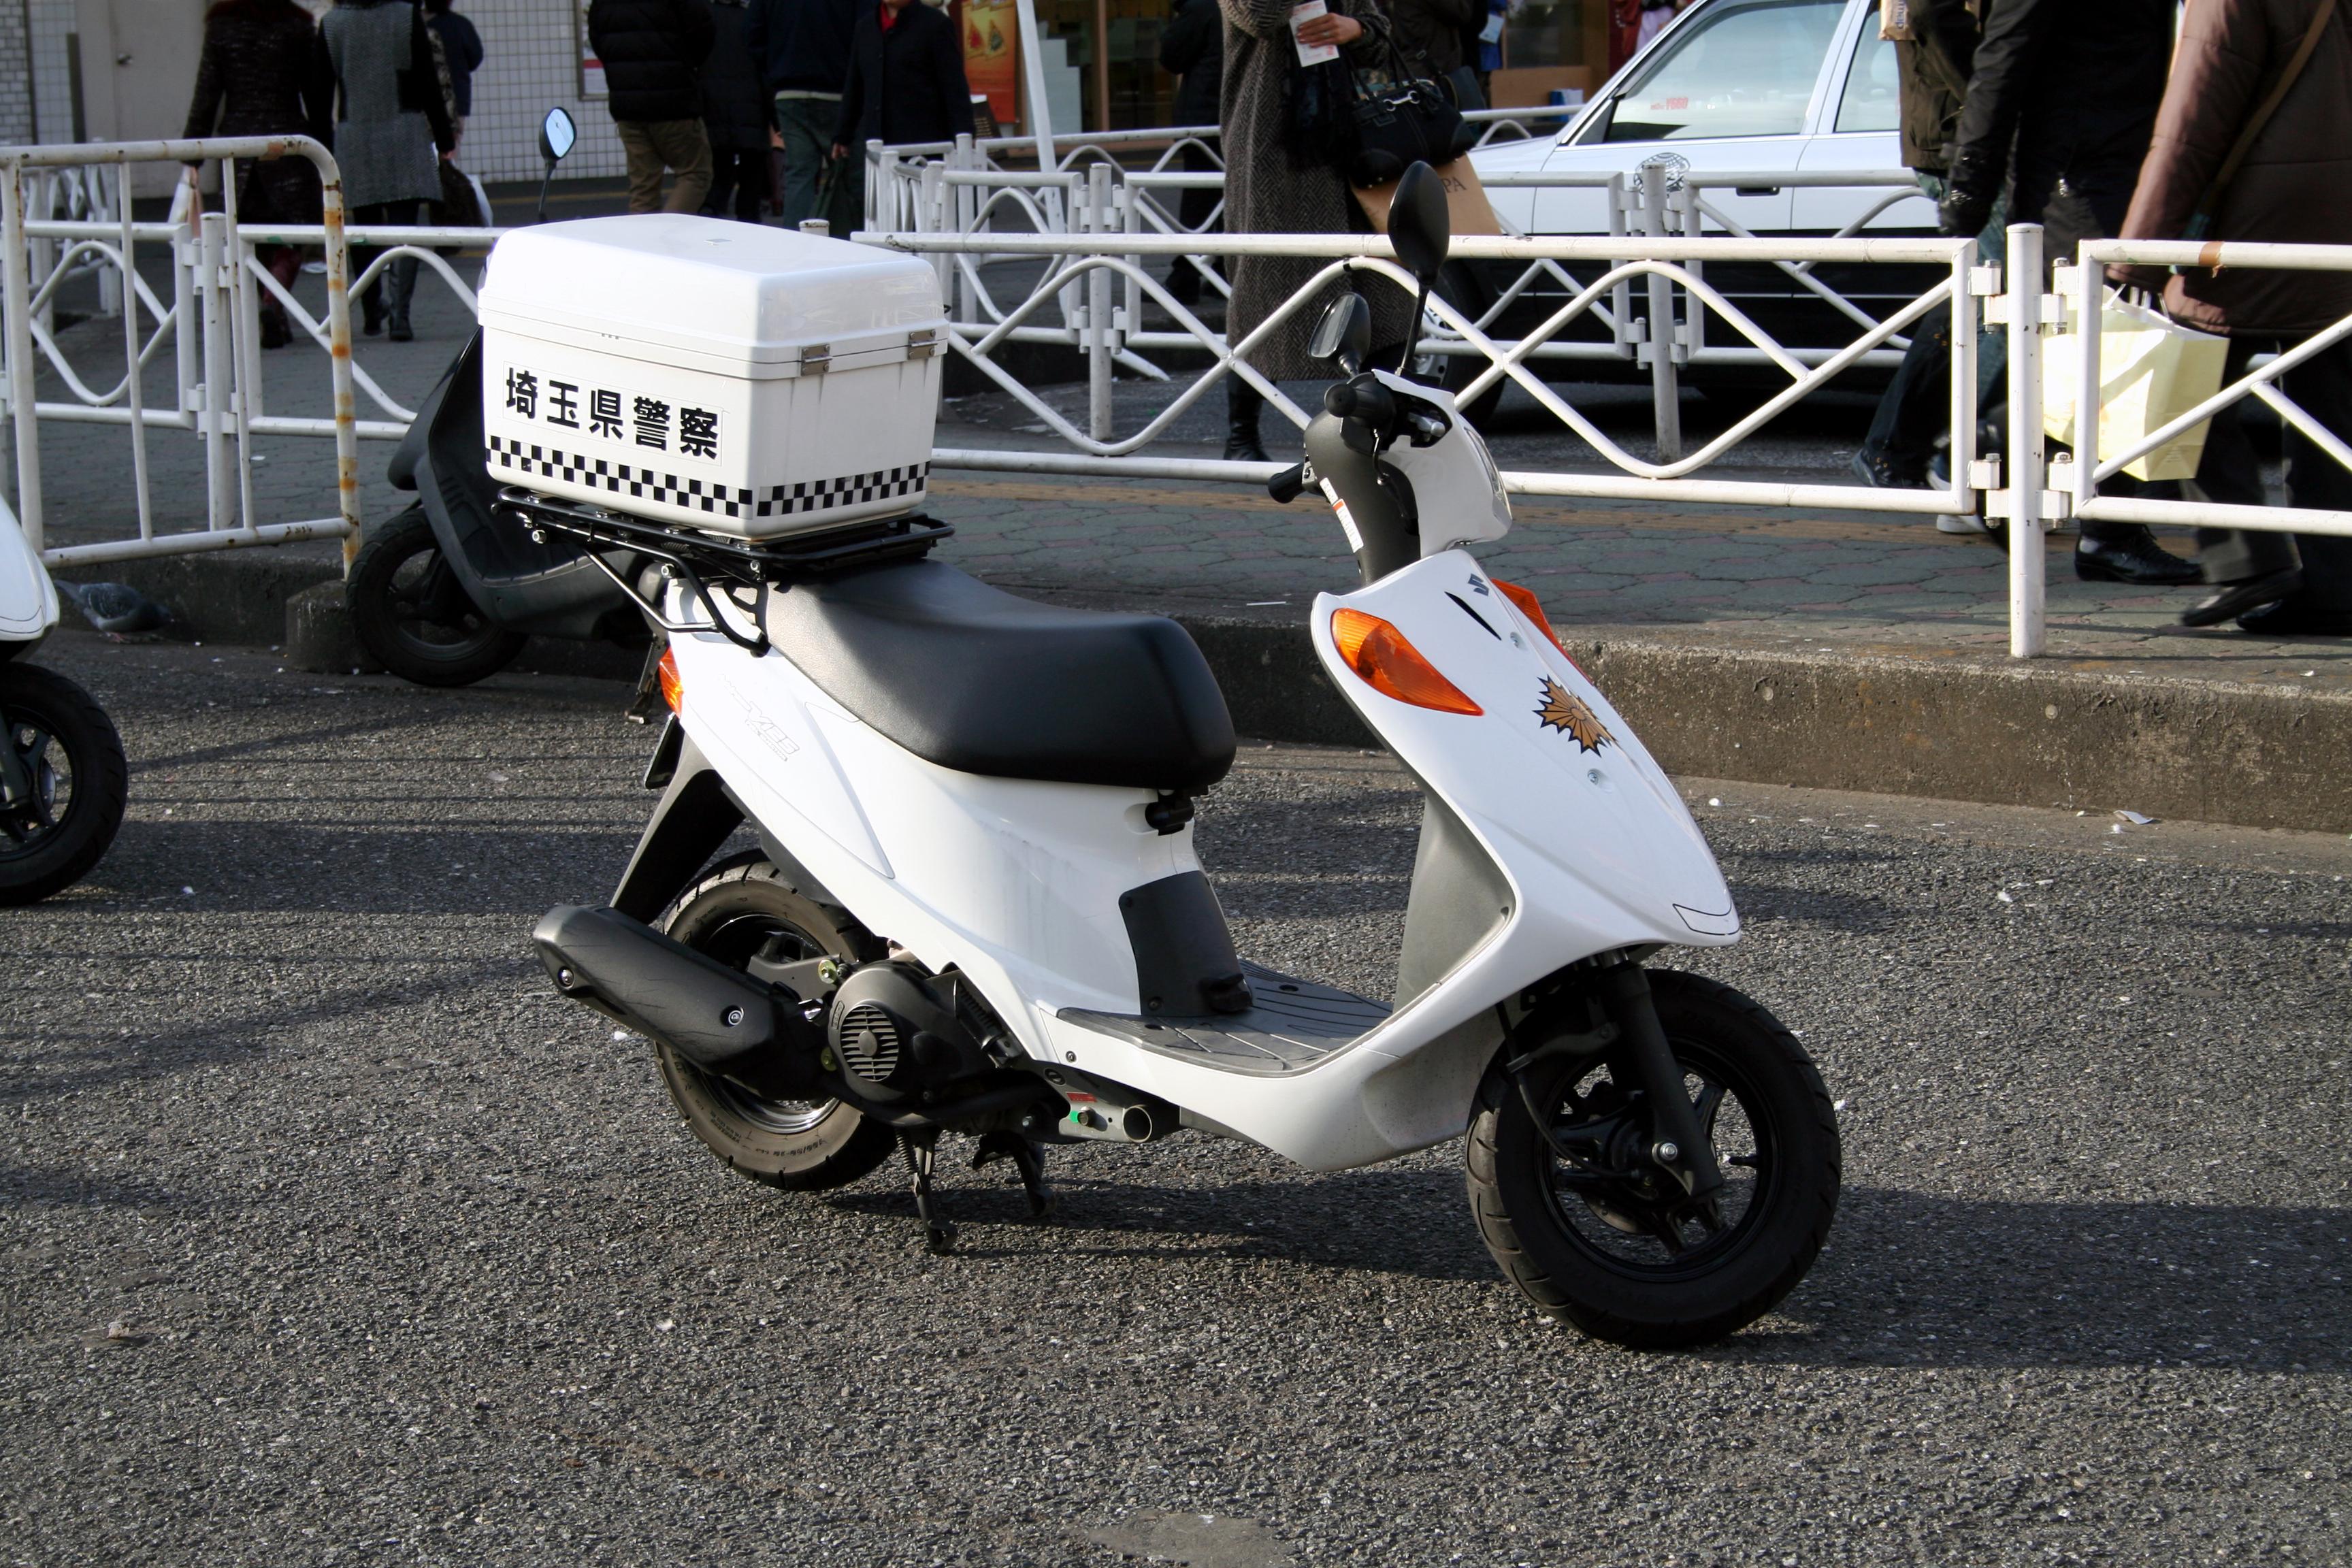 suzuki address 125 scooter. Black Bedroom Furniture Sets. Home Design Ideas